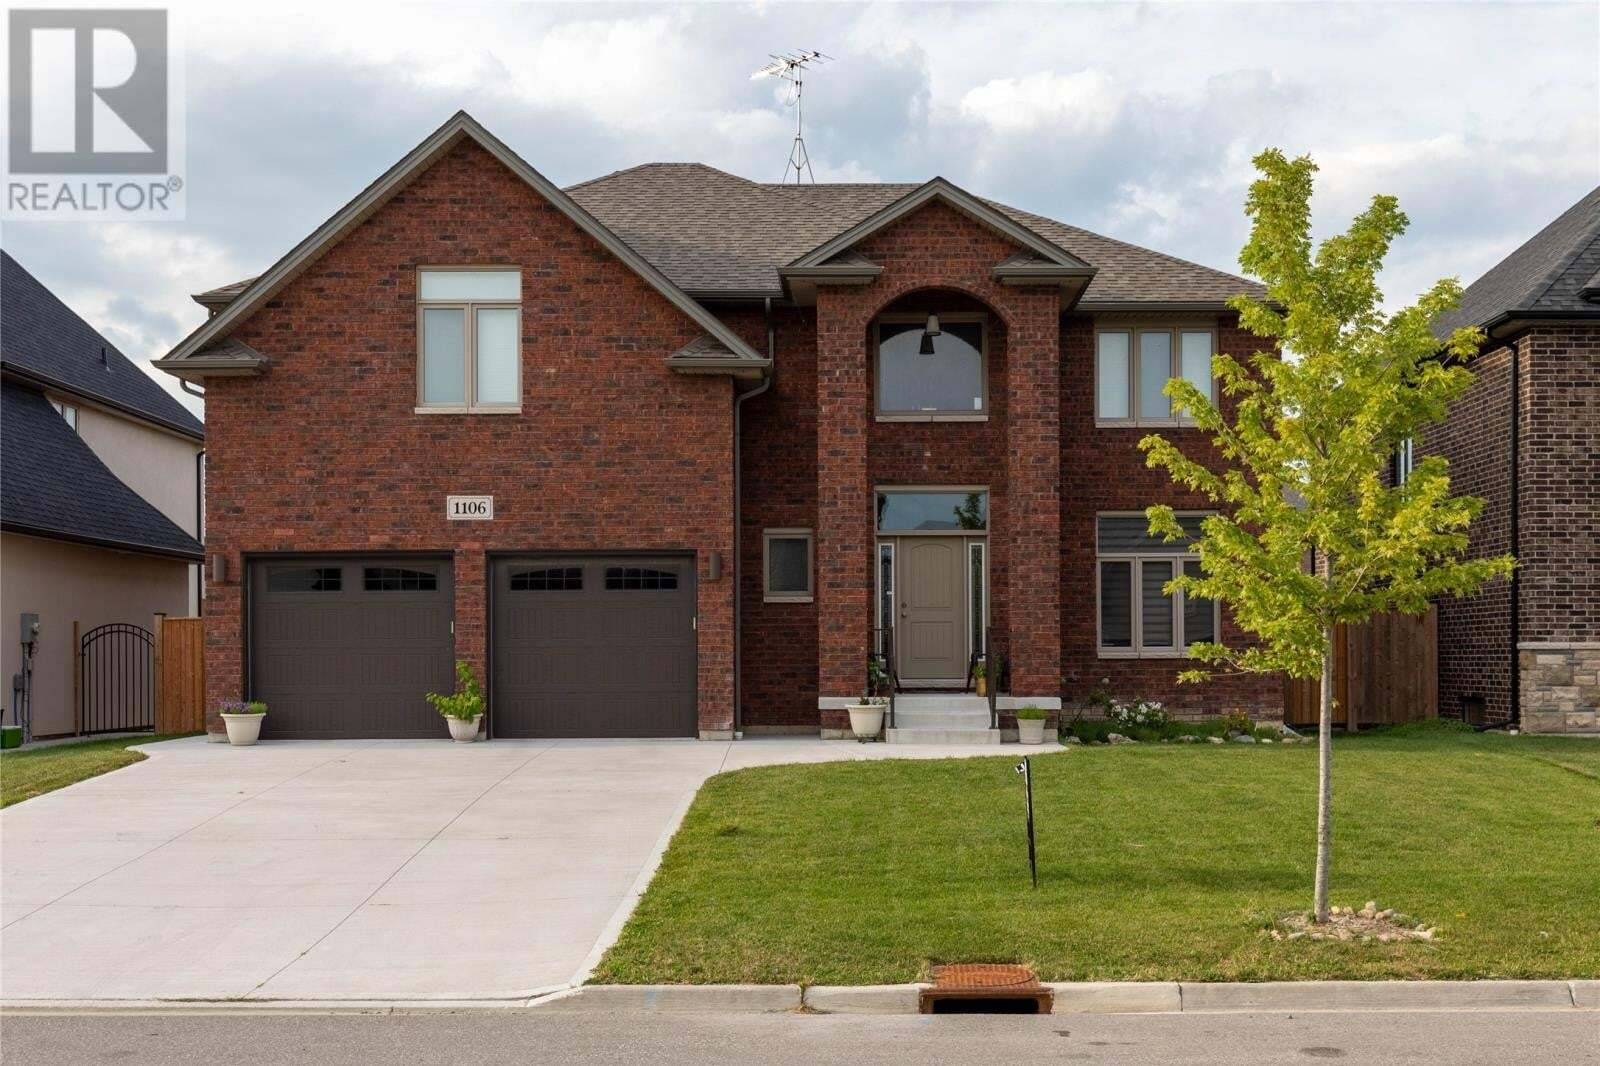 House for sale at 1106 Ryan  Lakeshore Ontario - MLS: 20005471